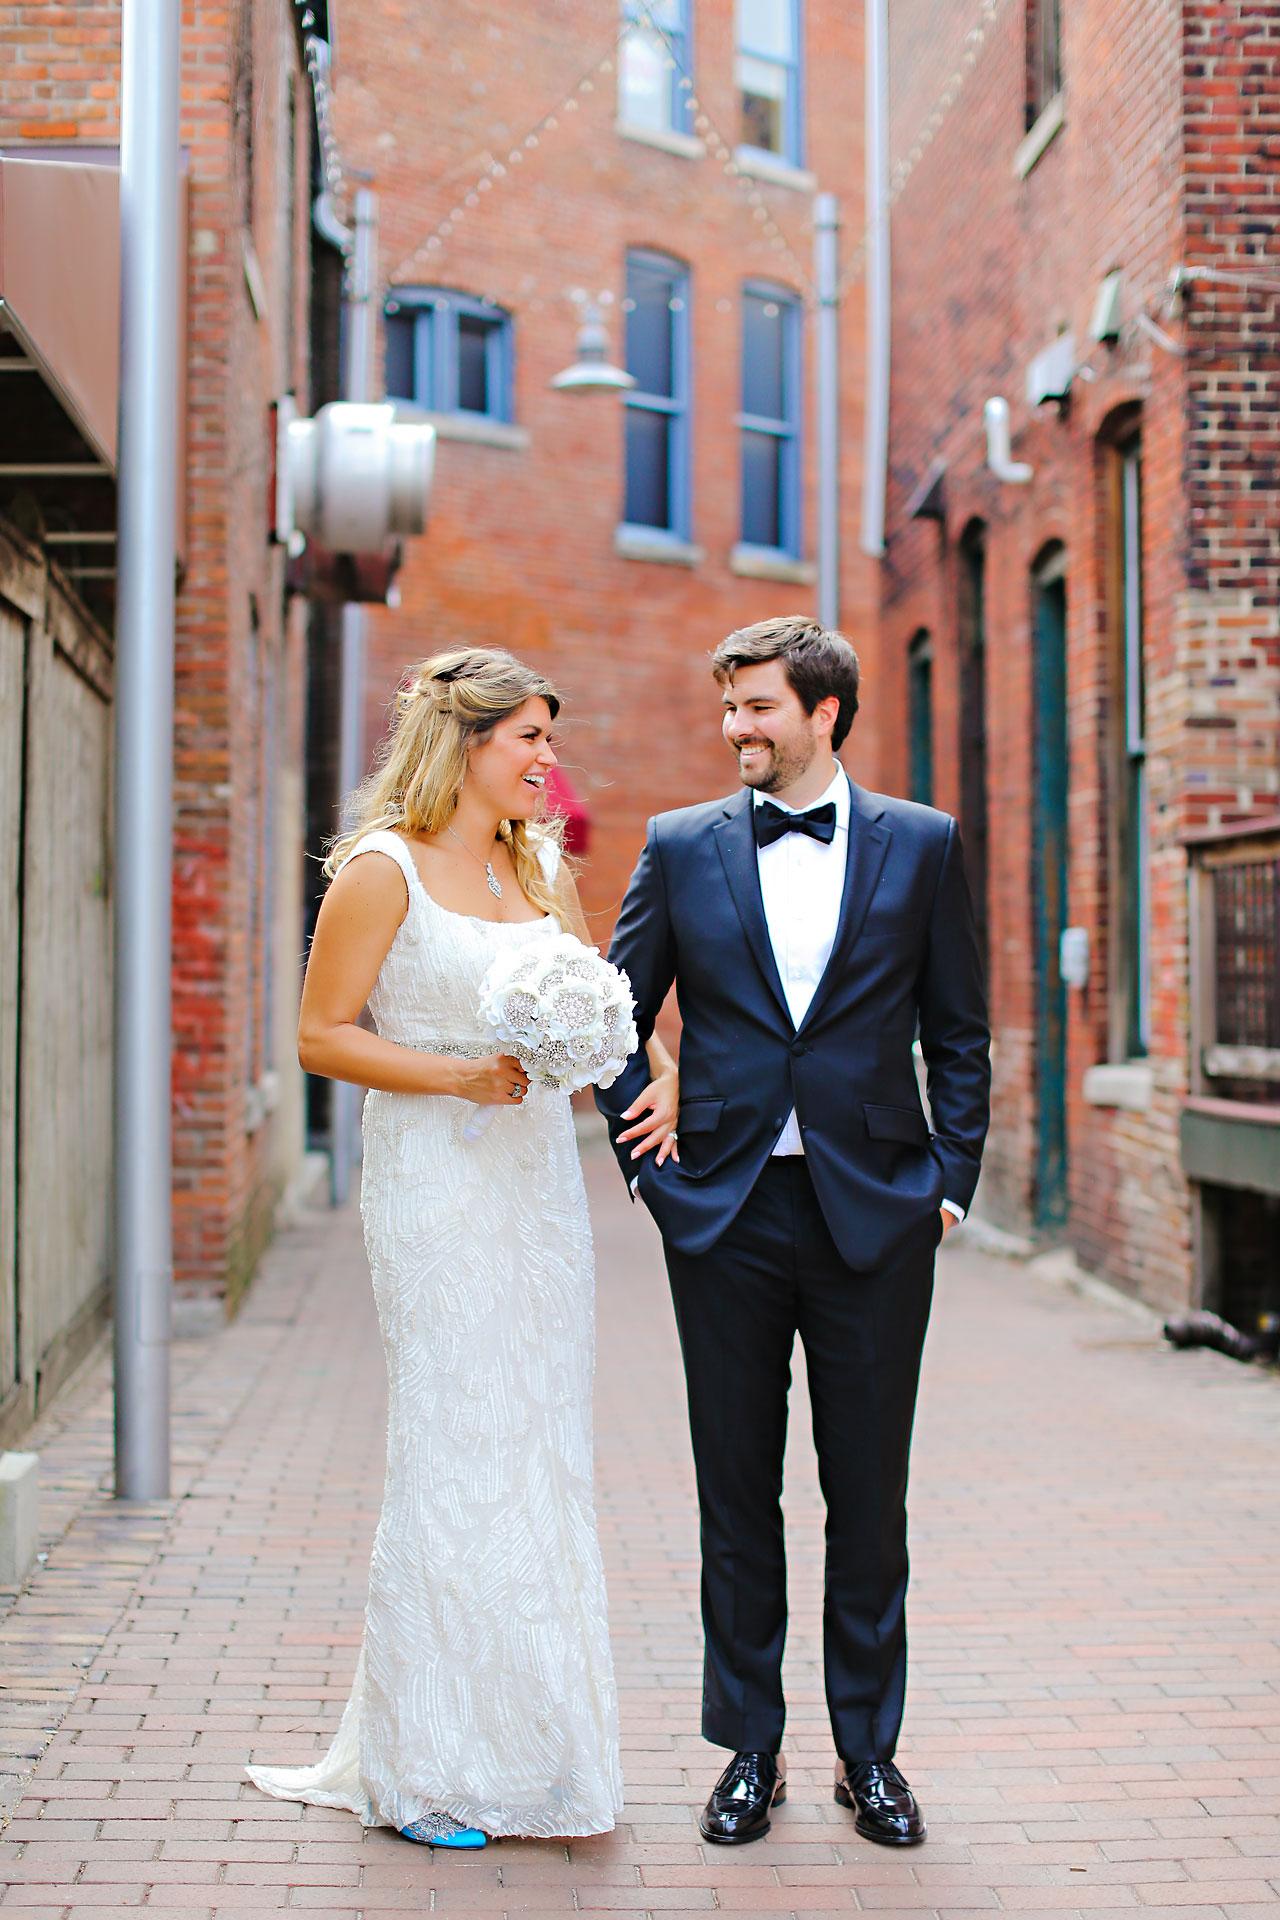 Amy Nick Canal 337 Wedding 102